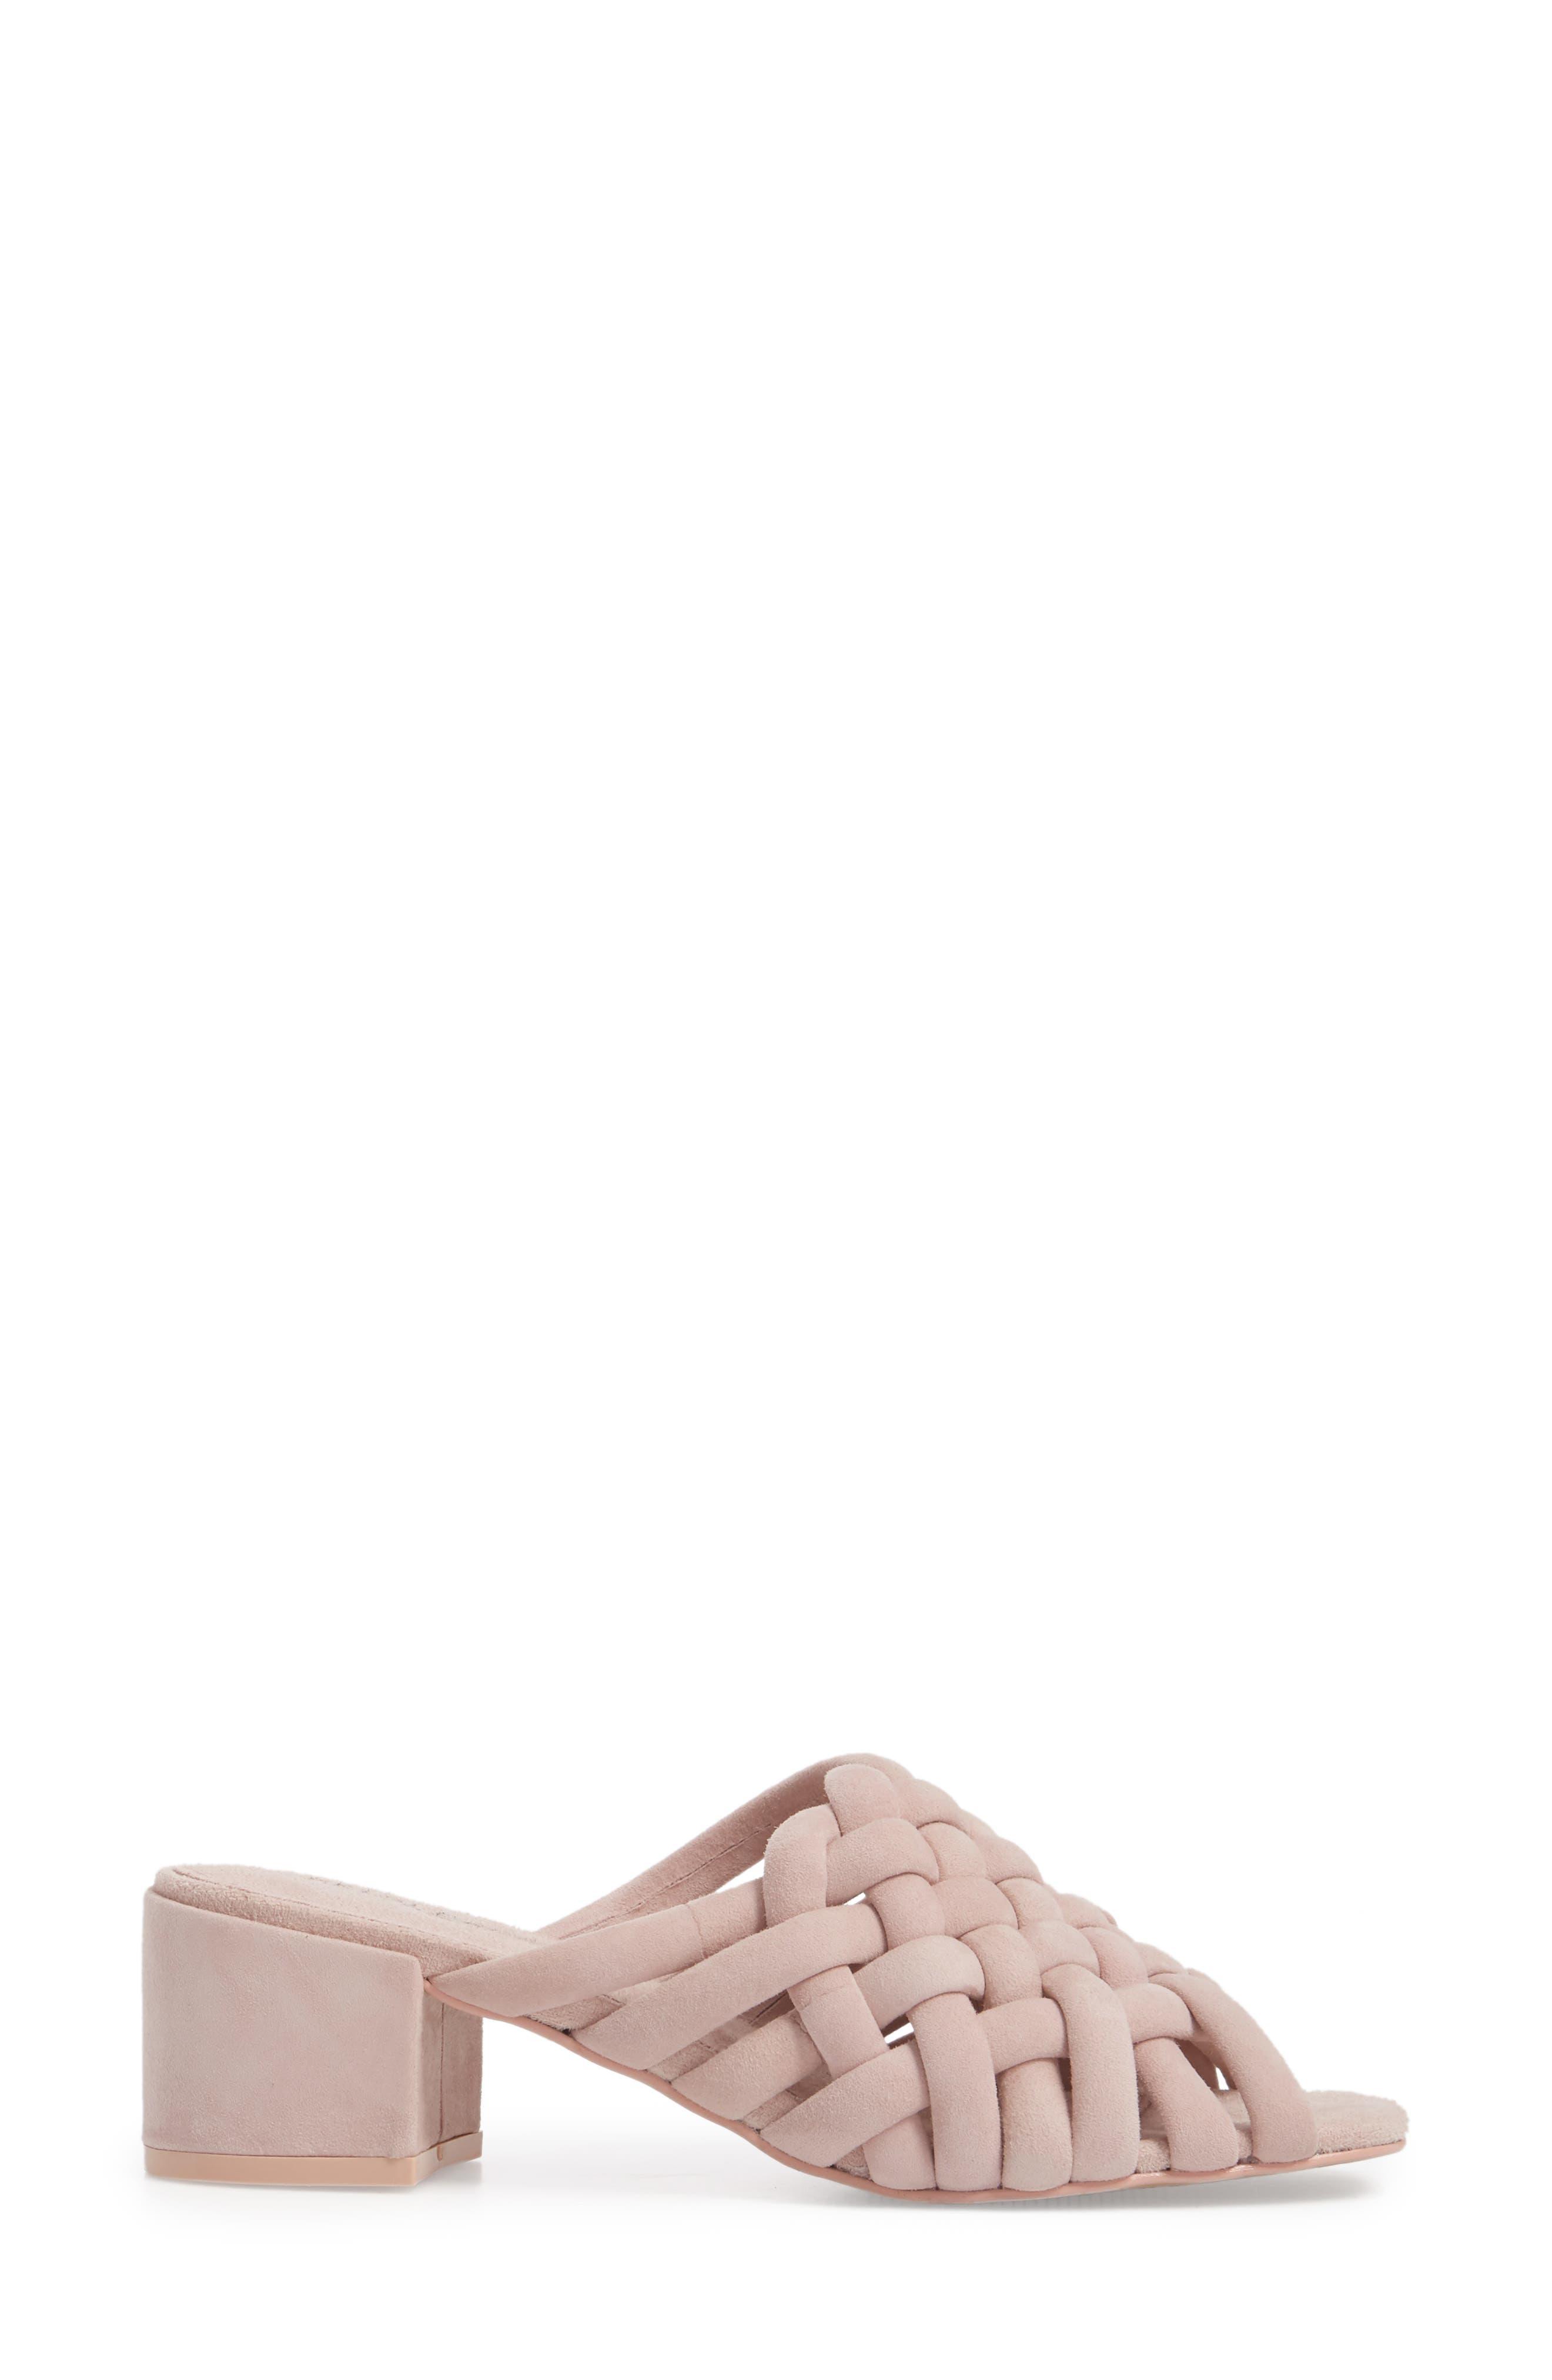 Sky Dress Woven Mule Sandal,                             Alternate thumbnail 3, color,                             Pale Pink